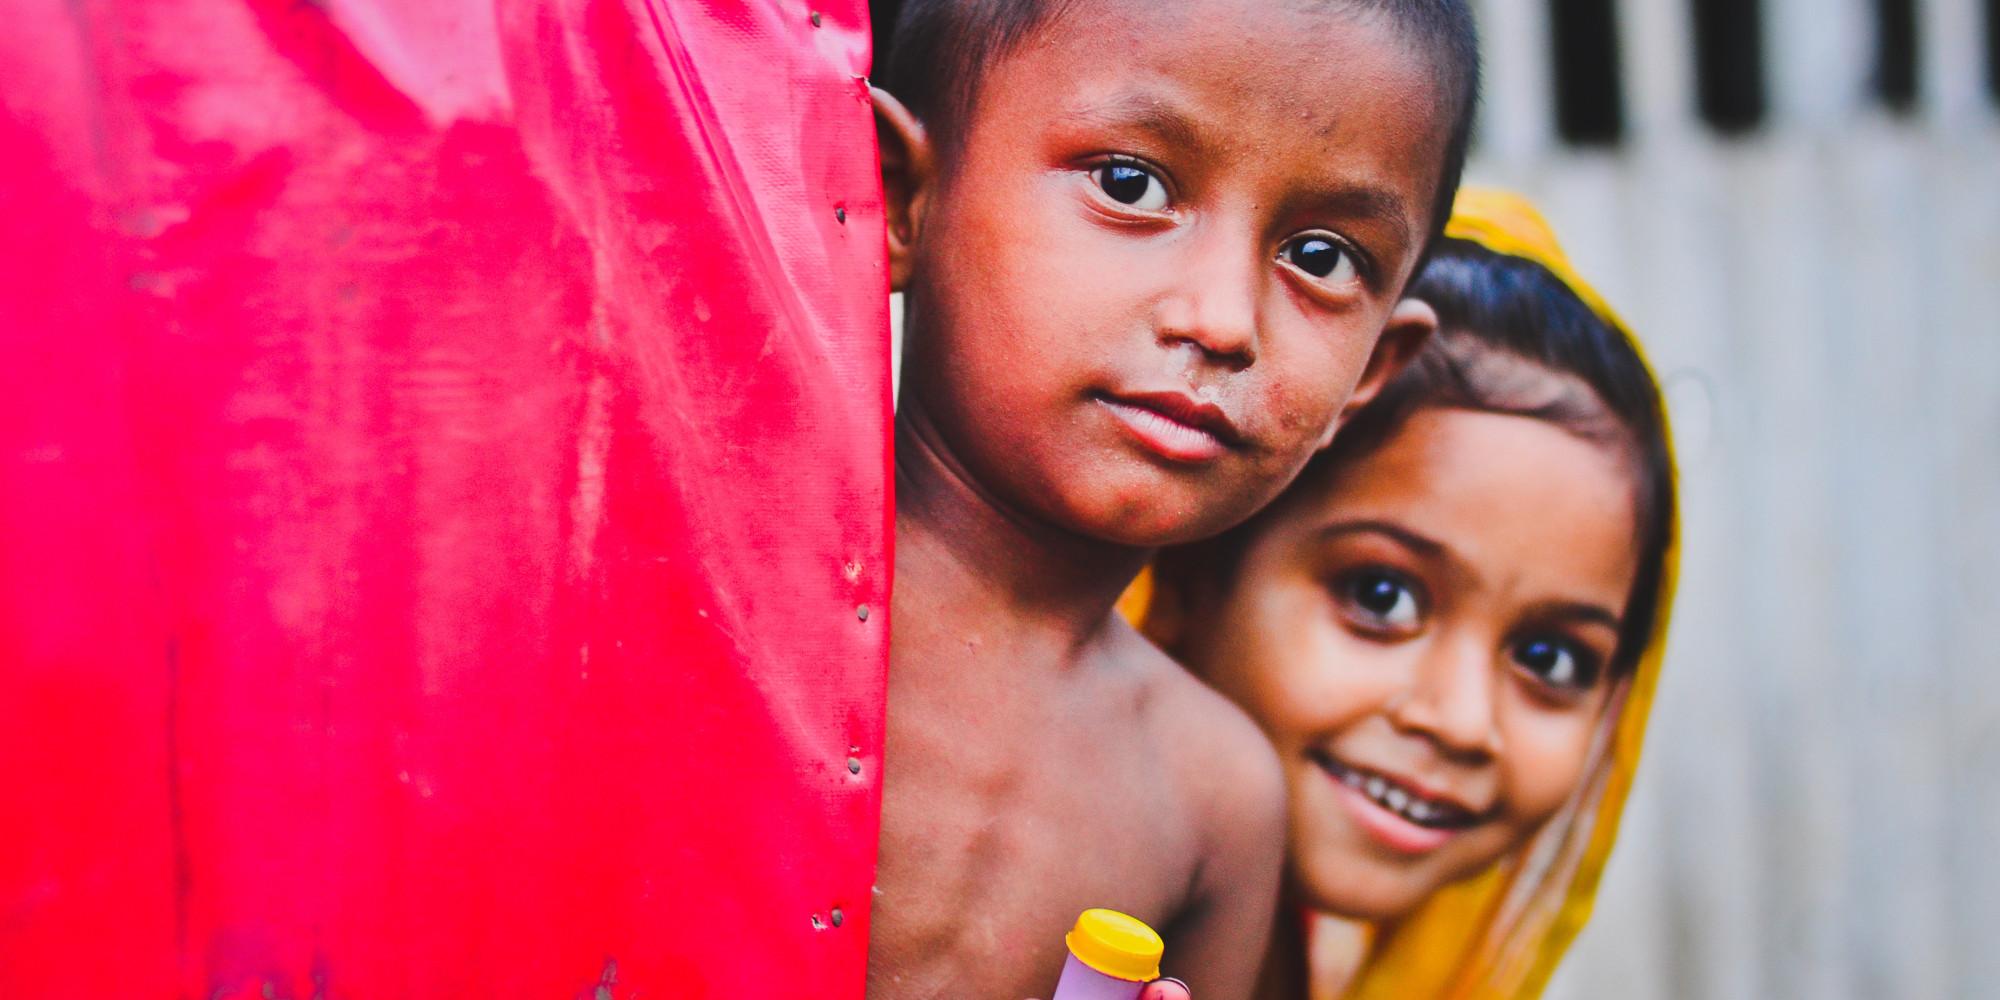 EU Donates 3.5B Euro To Combat Malnutrition In 50